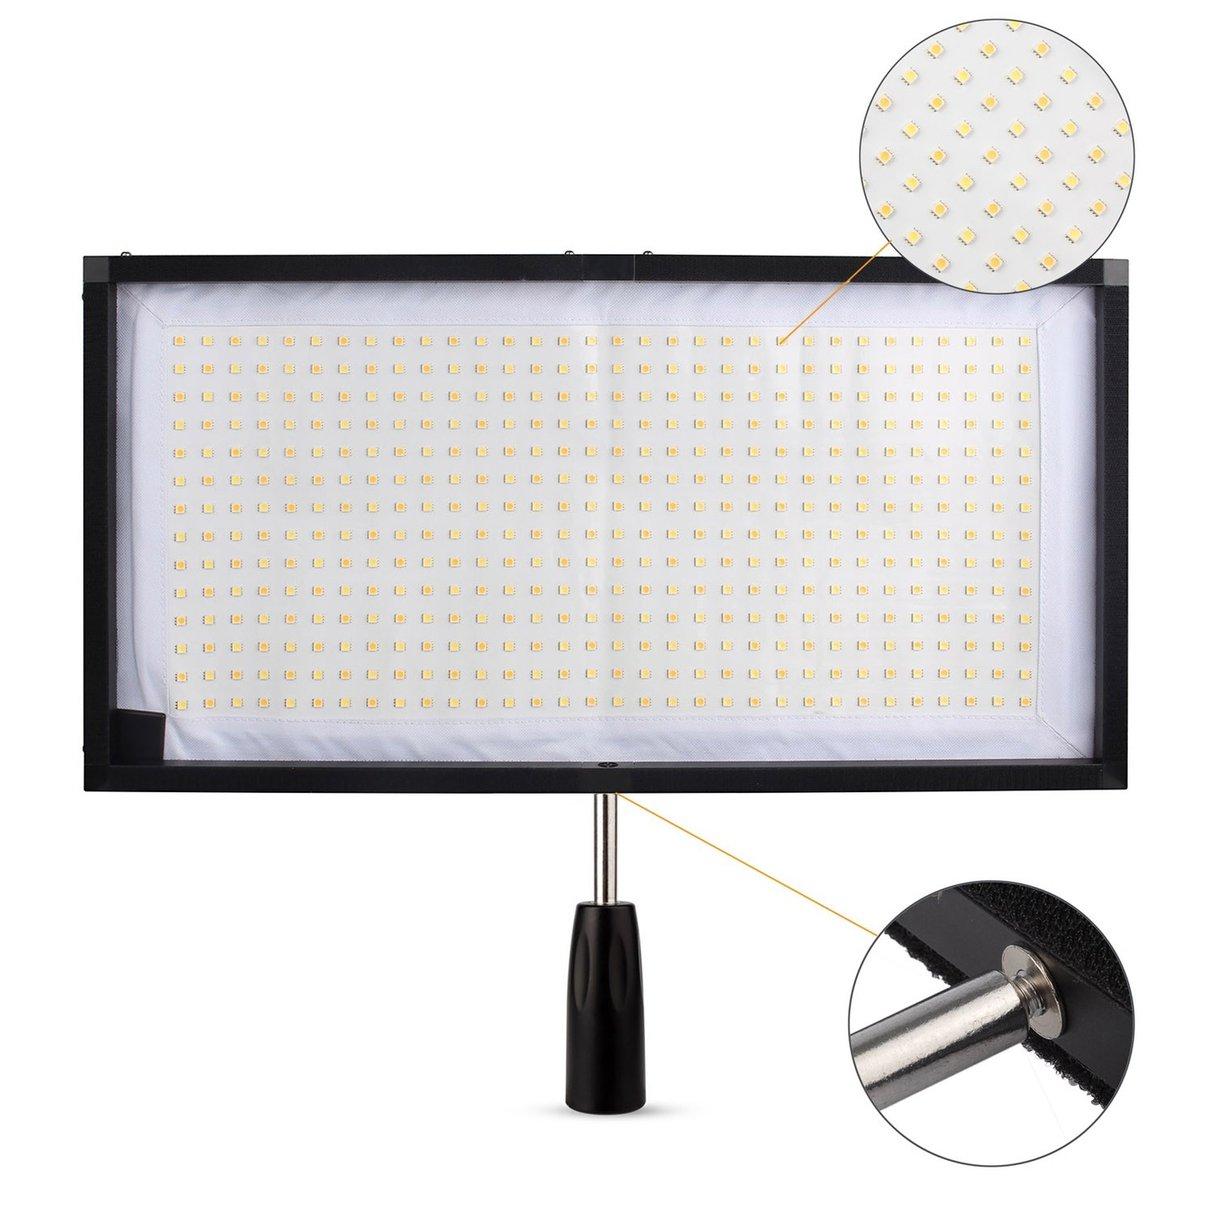 FL-3060 Flex Mat 480 LED Lumens Max 8000LM Flexible Moldable LED Video Fabric Light Slim Ultralight PaneL with 2.4G Remote цена